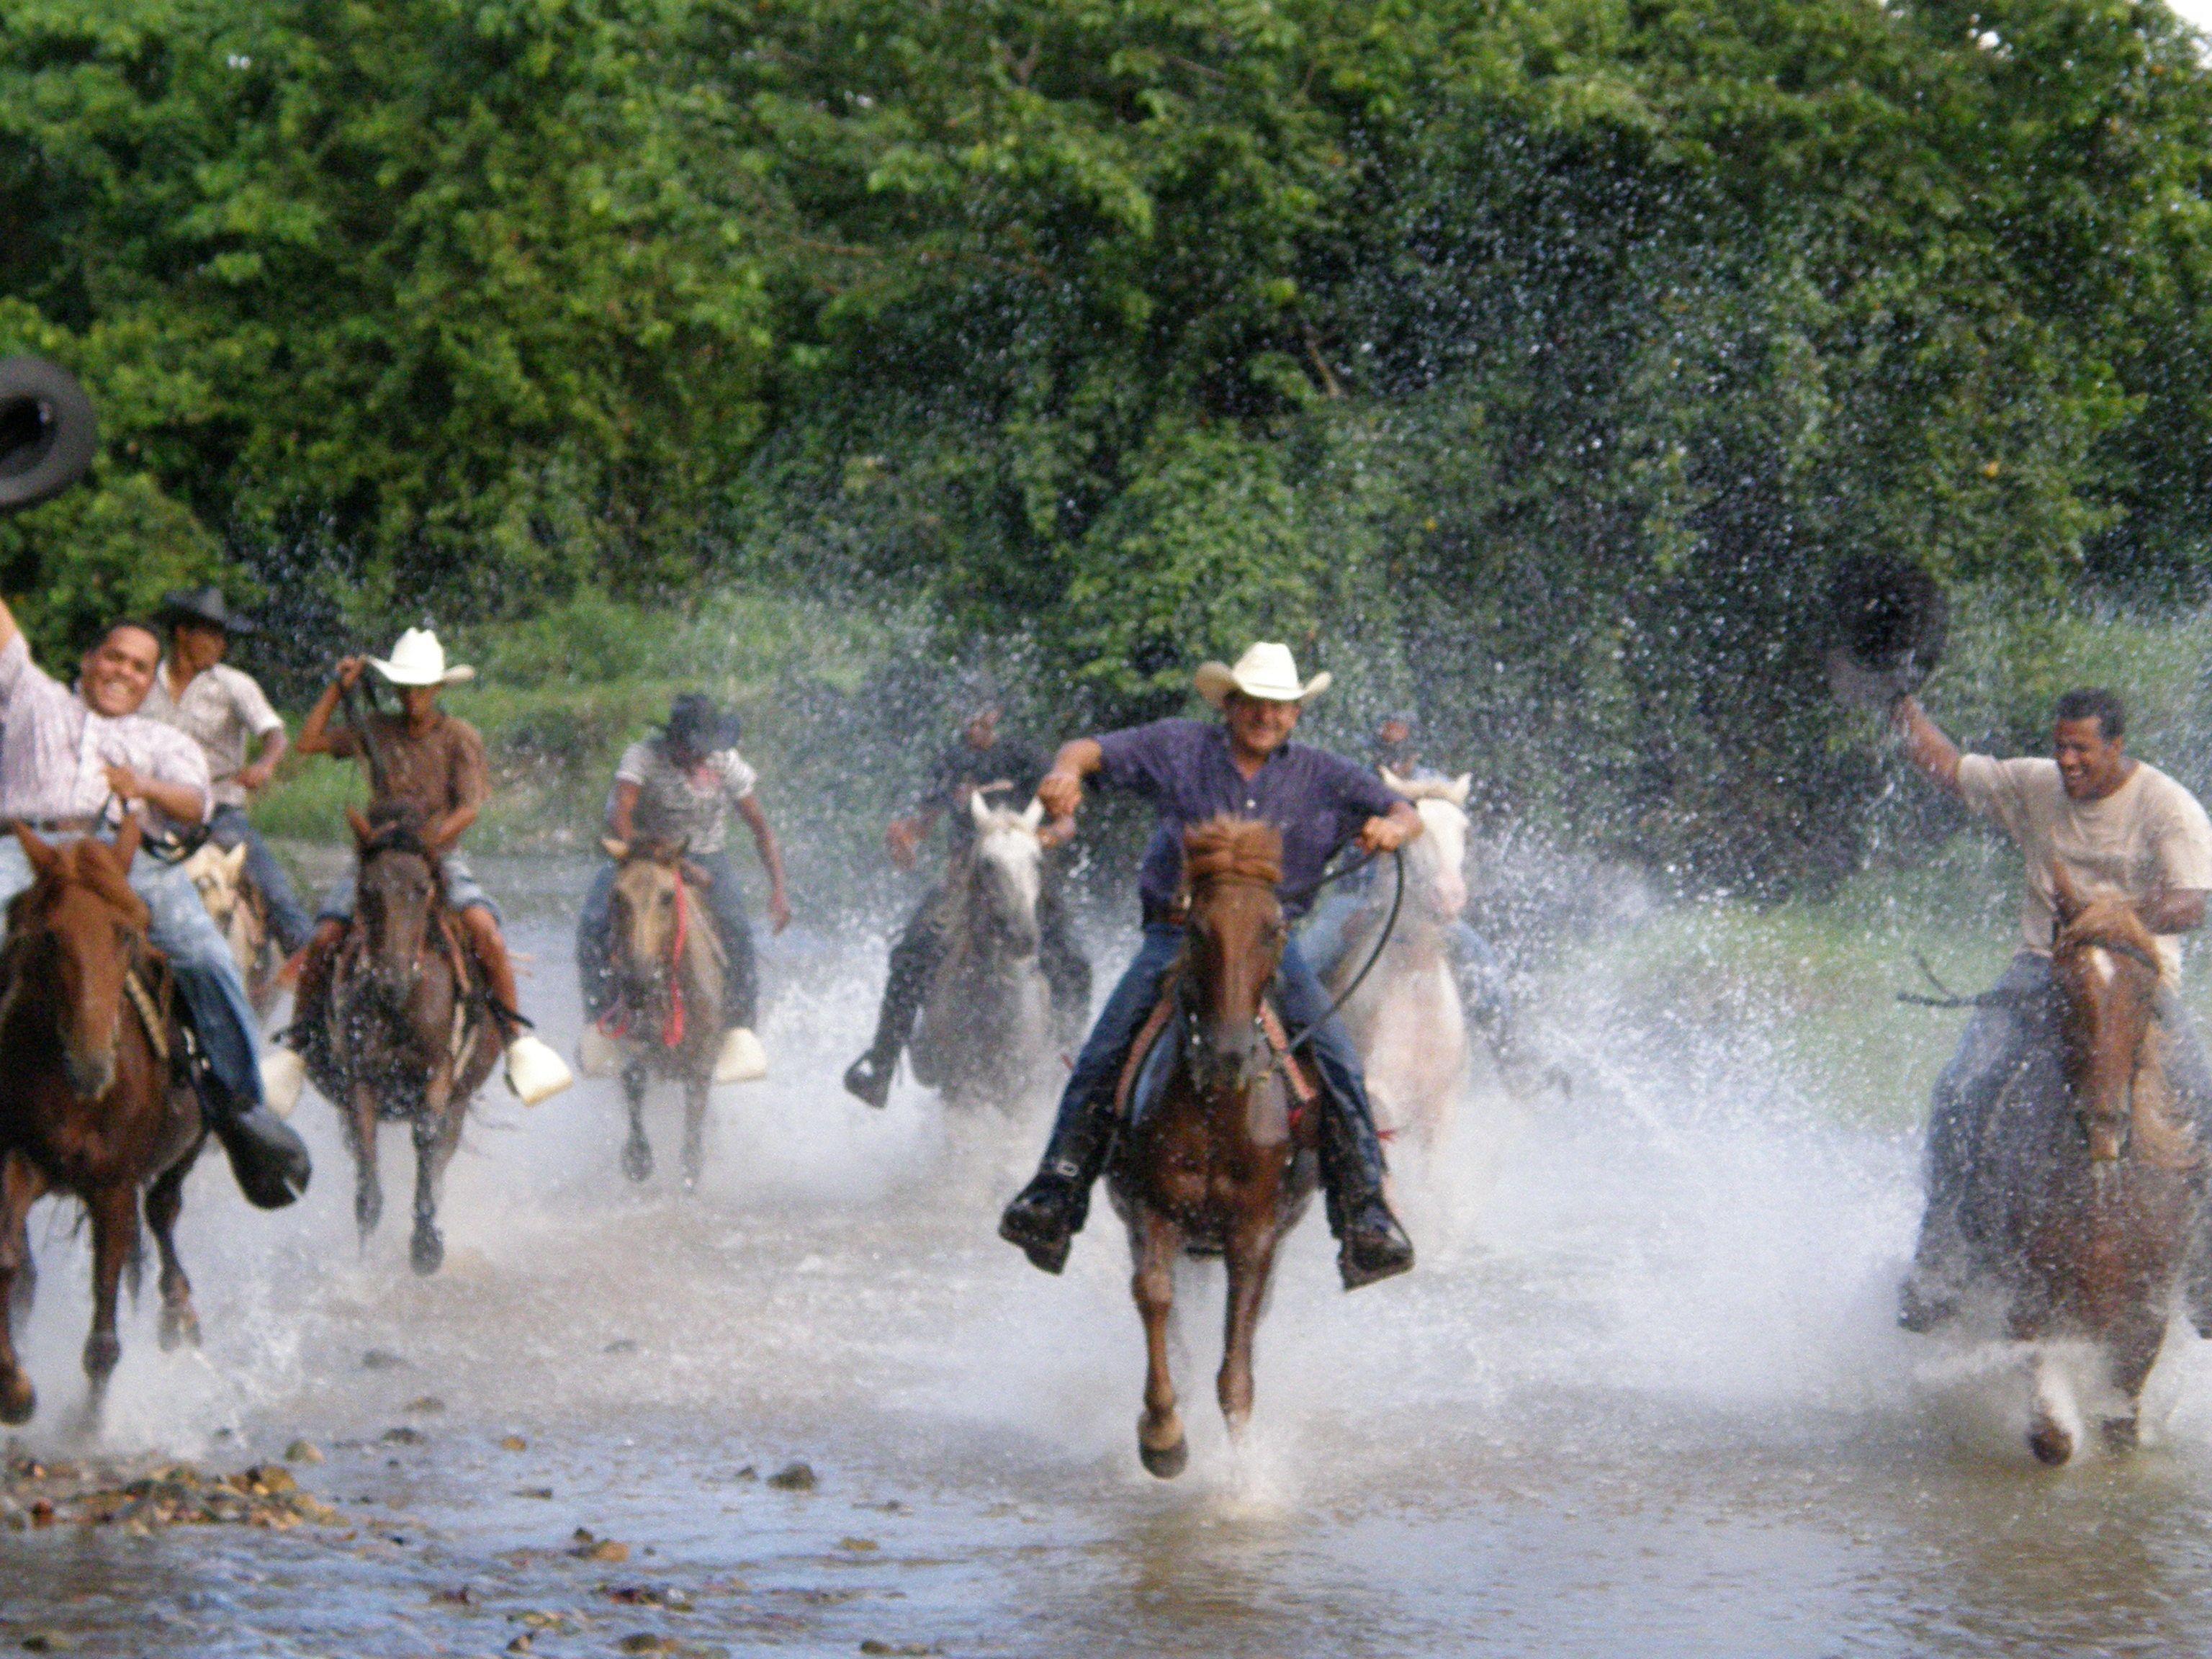 Horseback riding group in Punta Cana